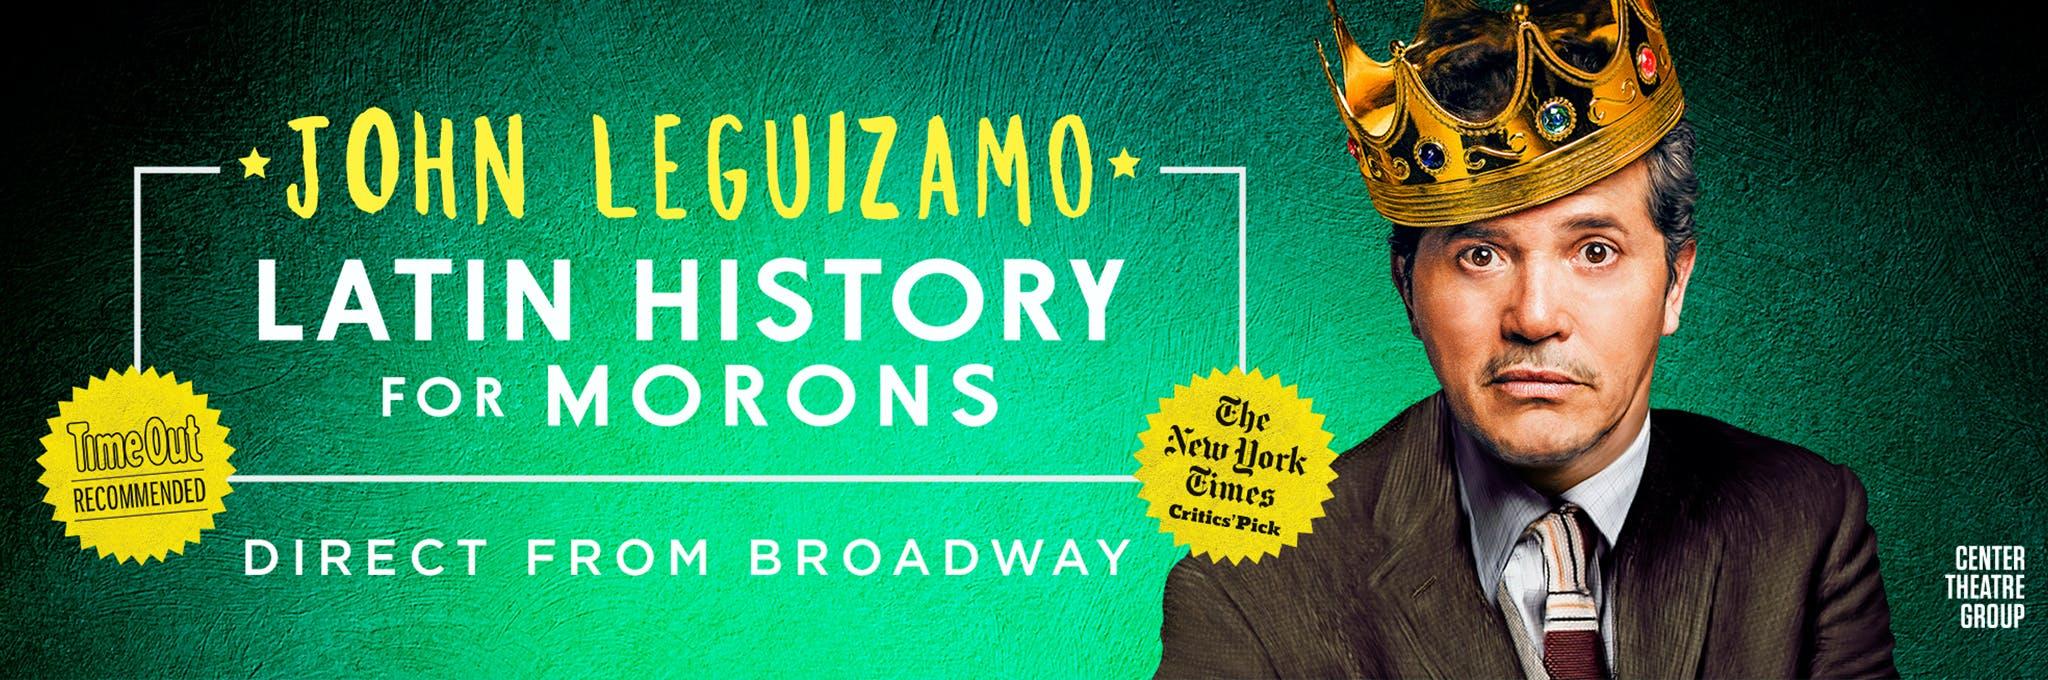 Latin History for Morons Logo